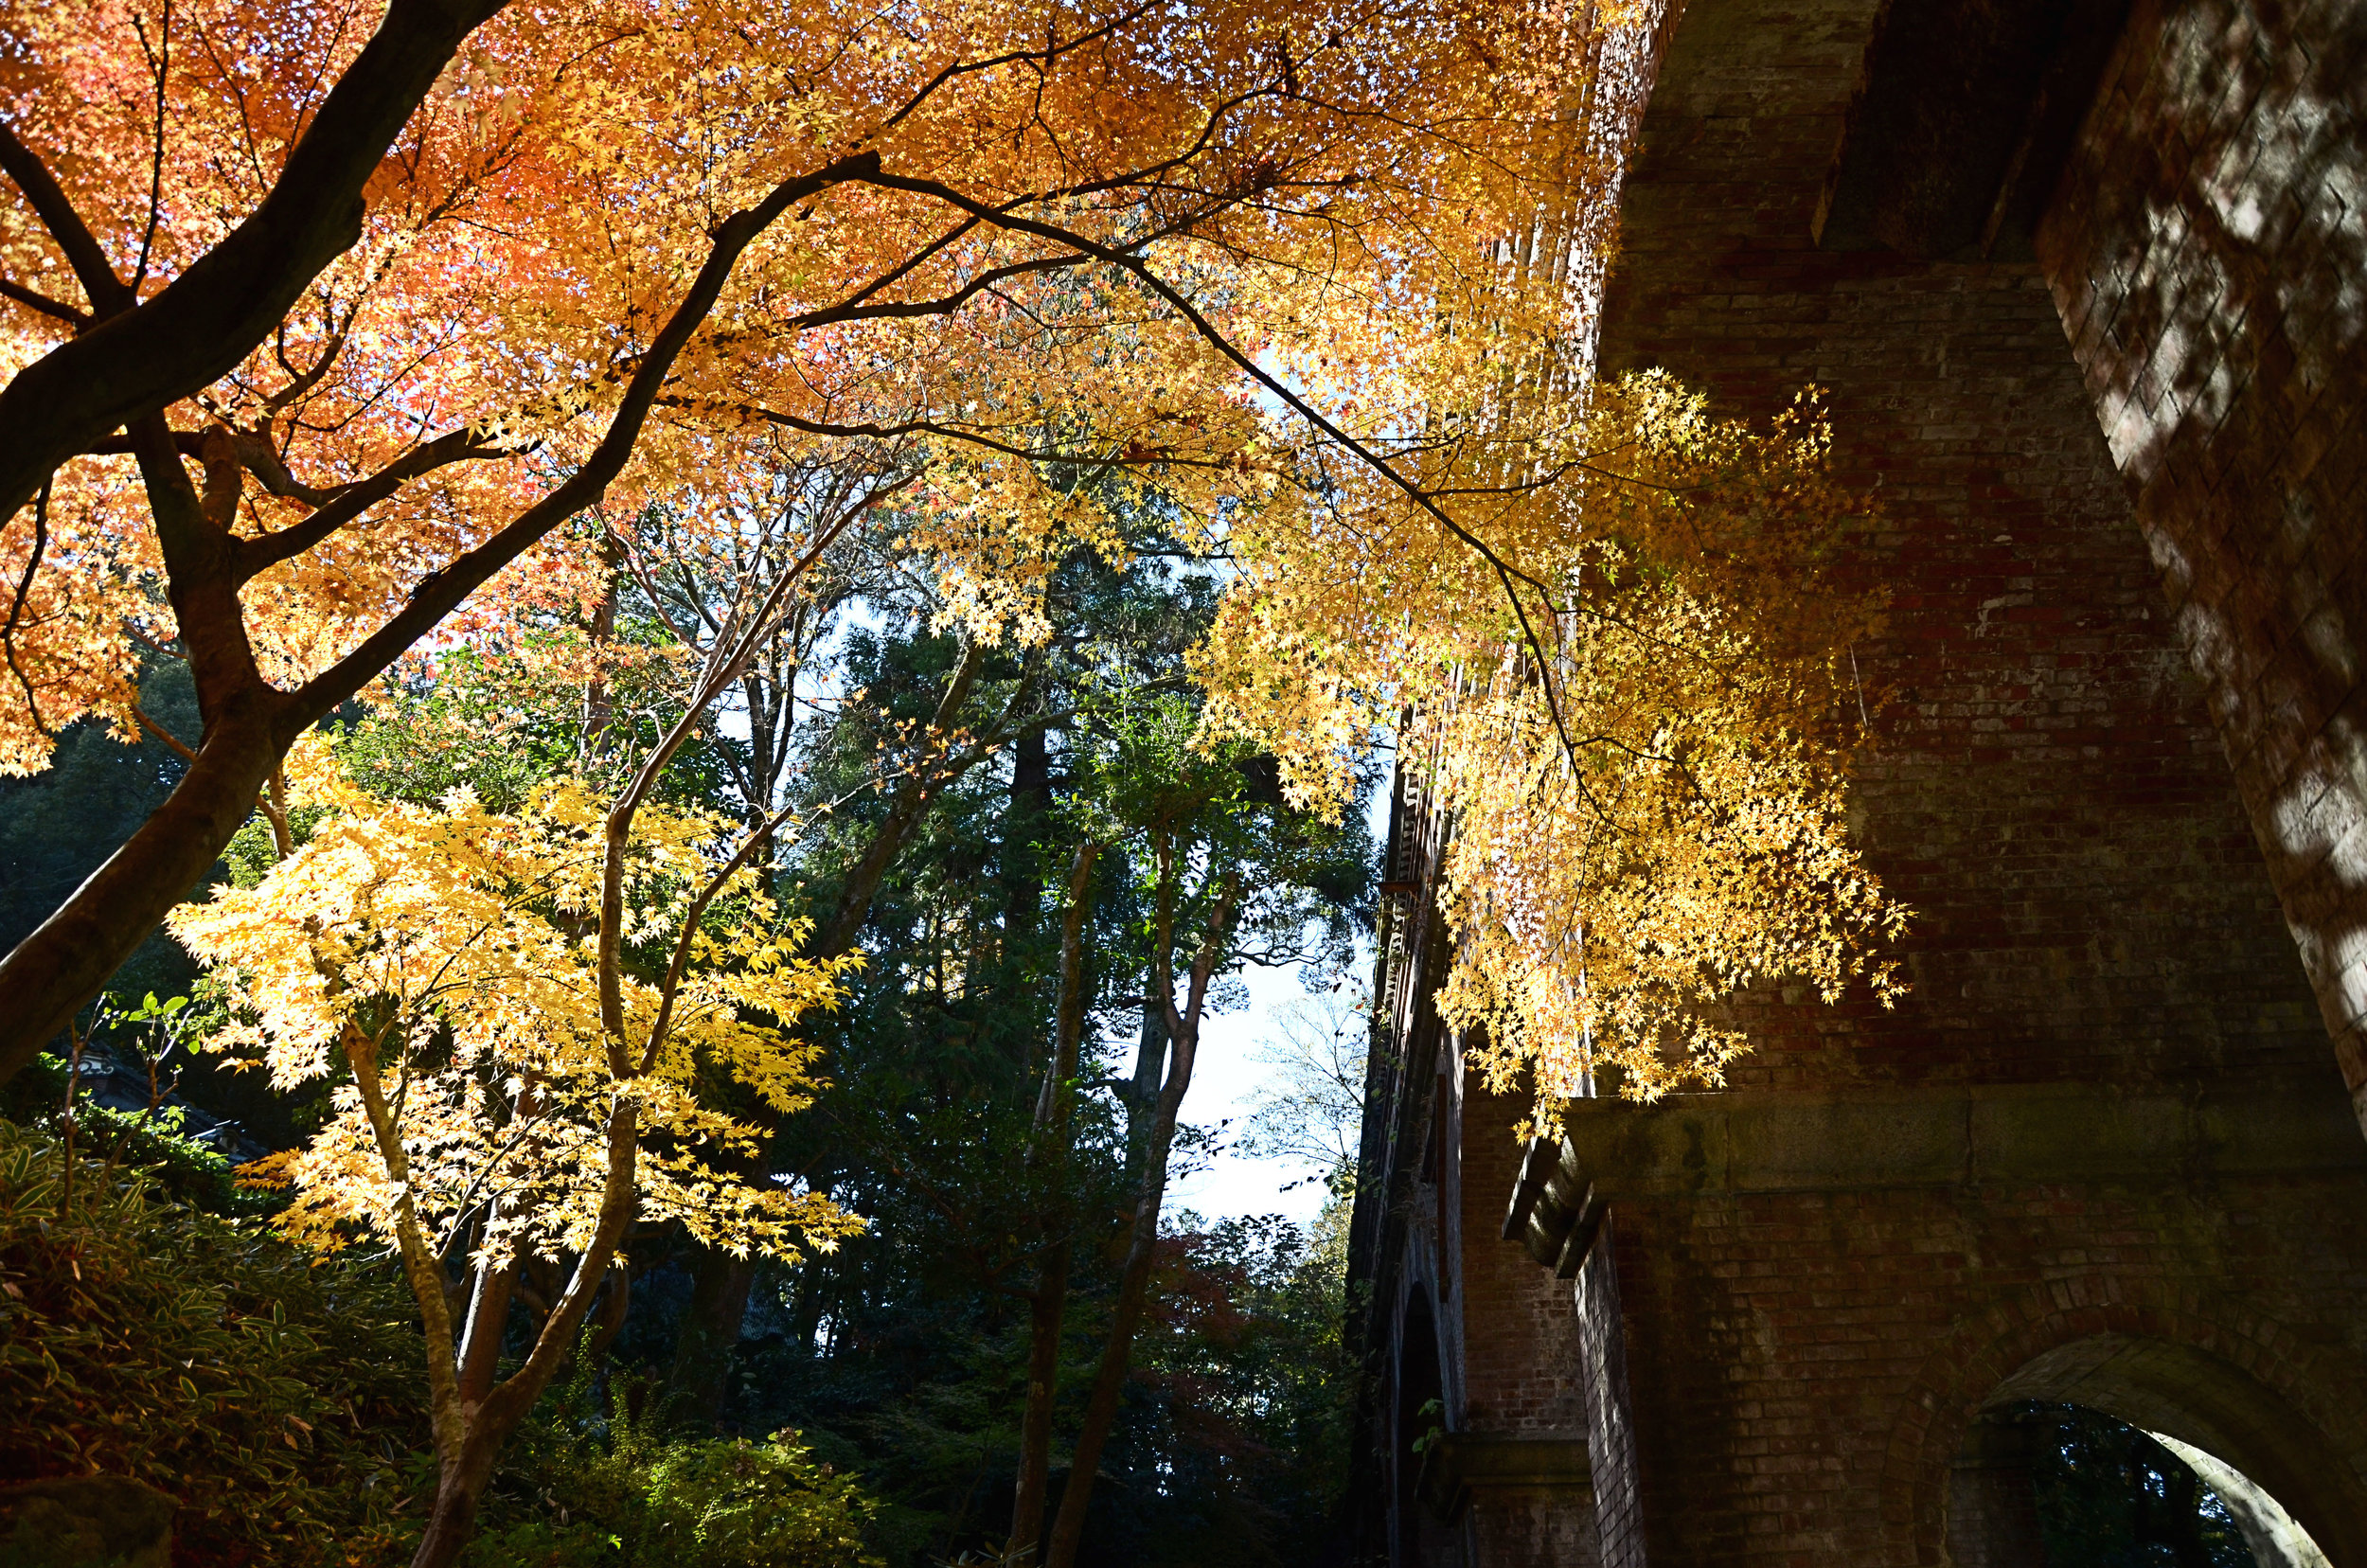 Fall leaves at Nanzen-ji temple in Kyoto